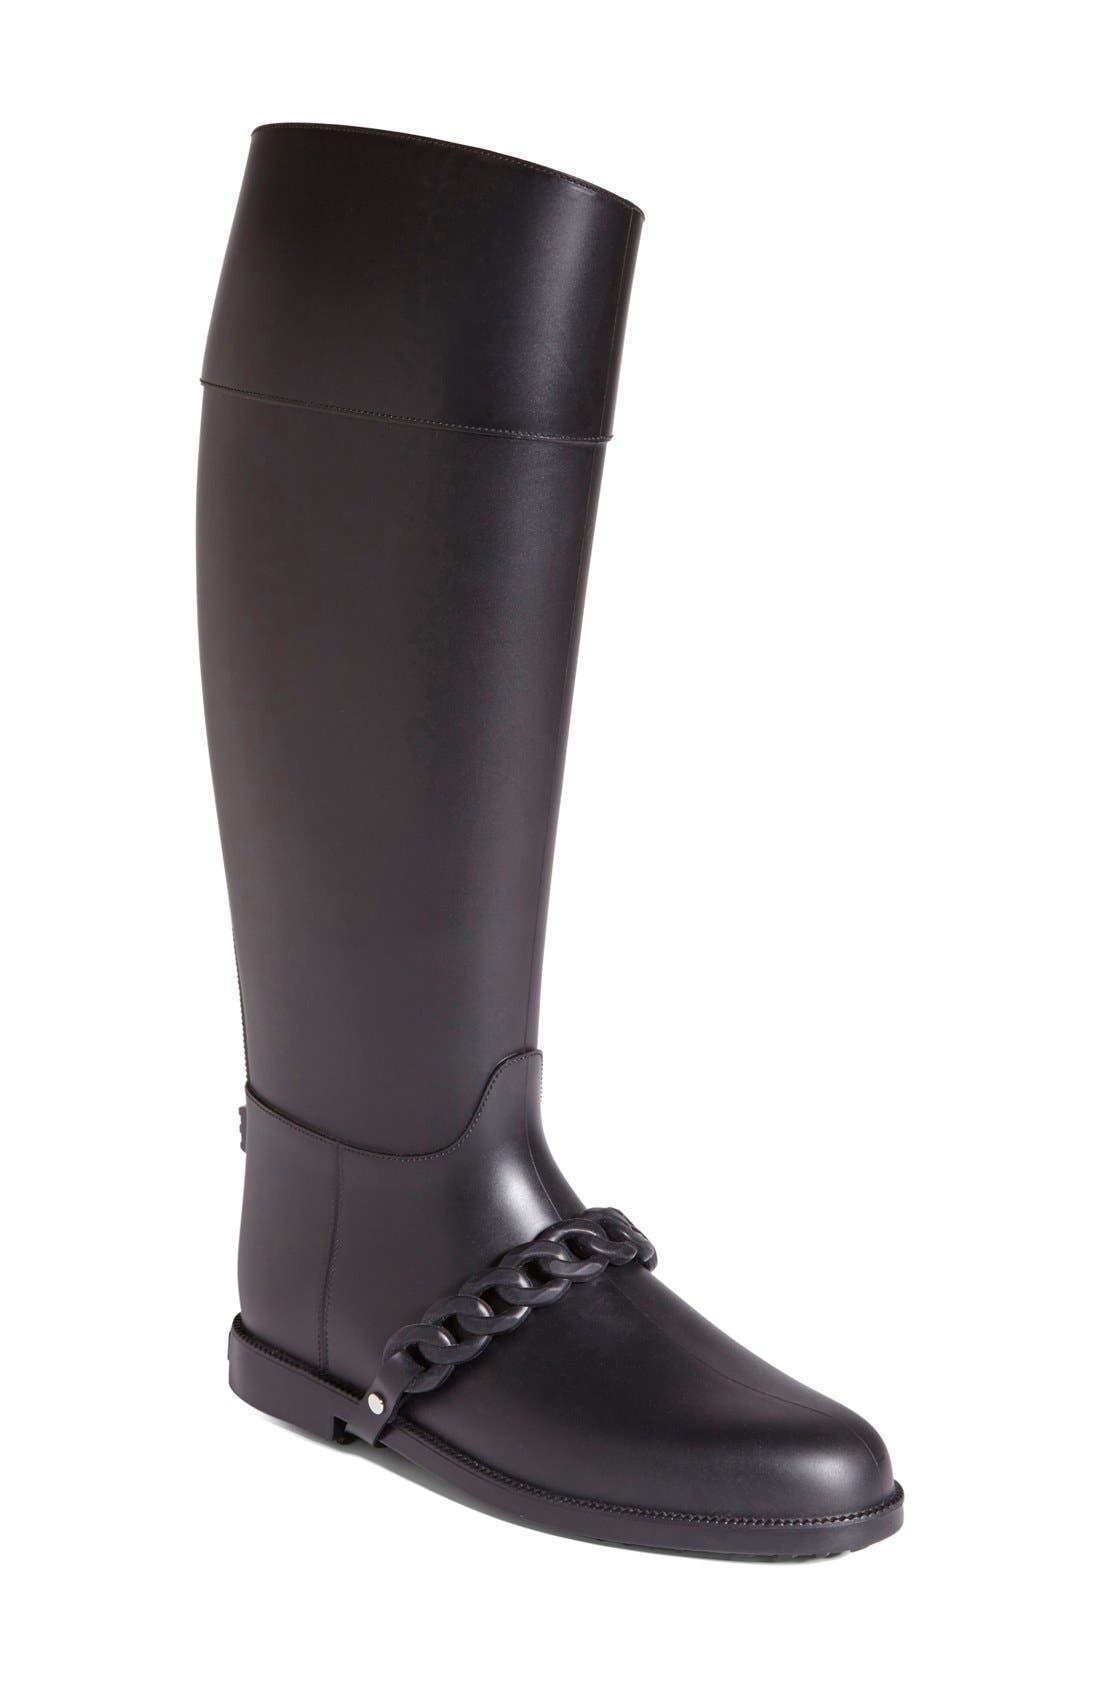 Alternate Image 1 Selected - Givenchy 'Eva Chain' Tall Rain Boot(Women)